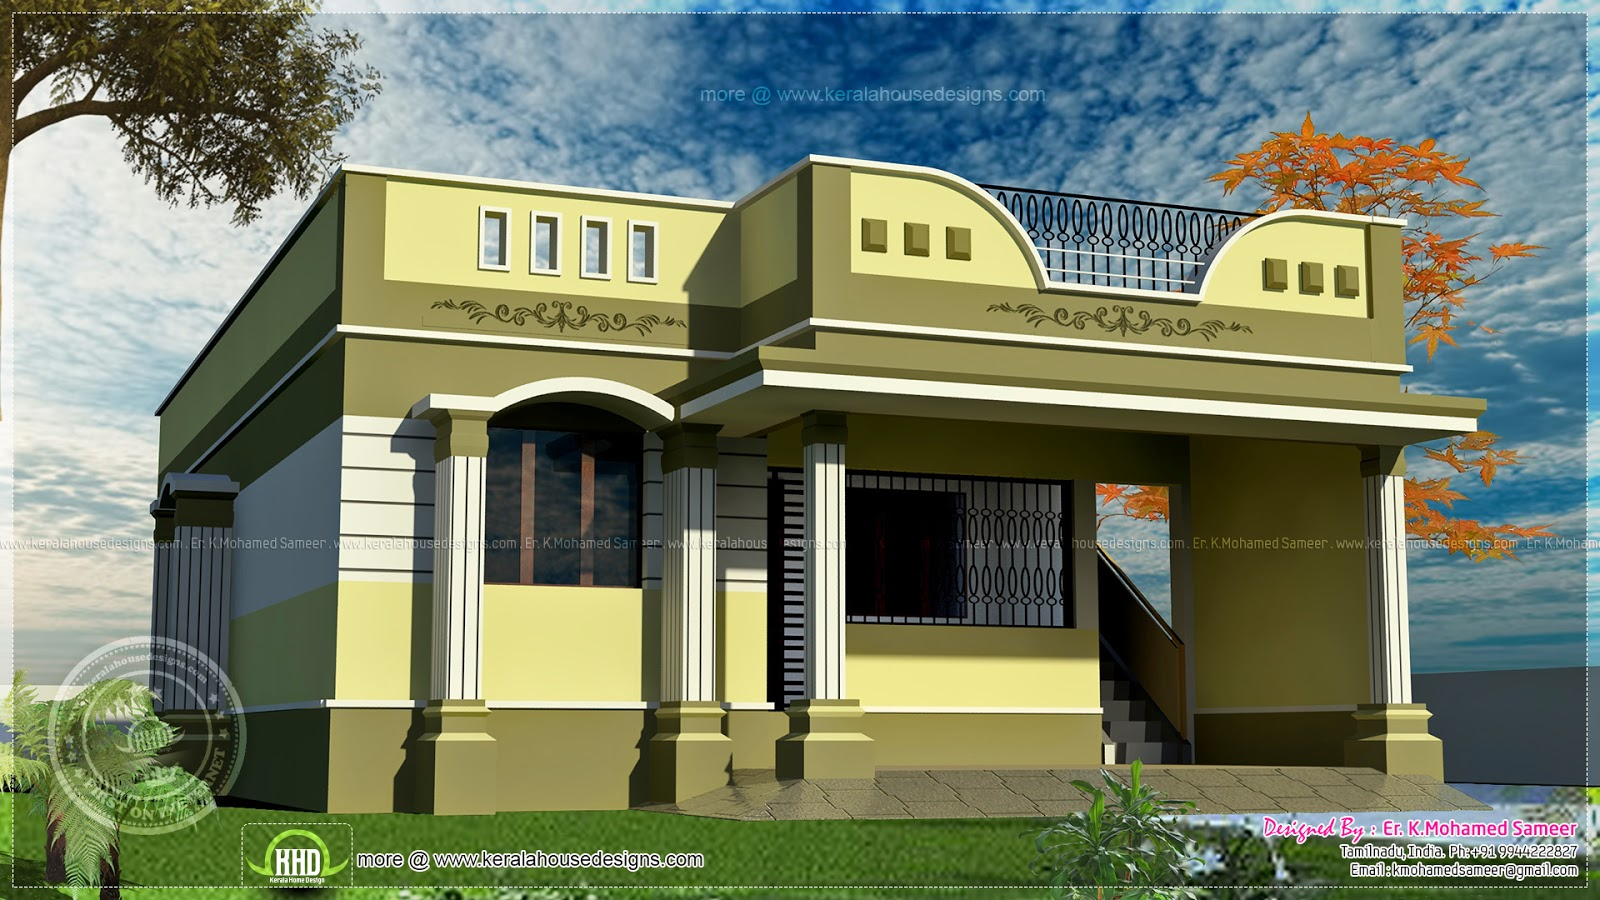 Home Plans Tamilnadu Home Free Custom Home Plans On Tamilnadu House Elevation Models